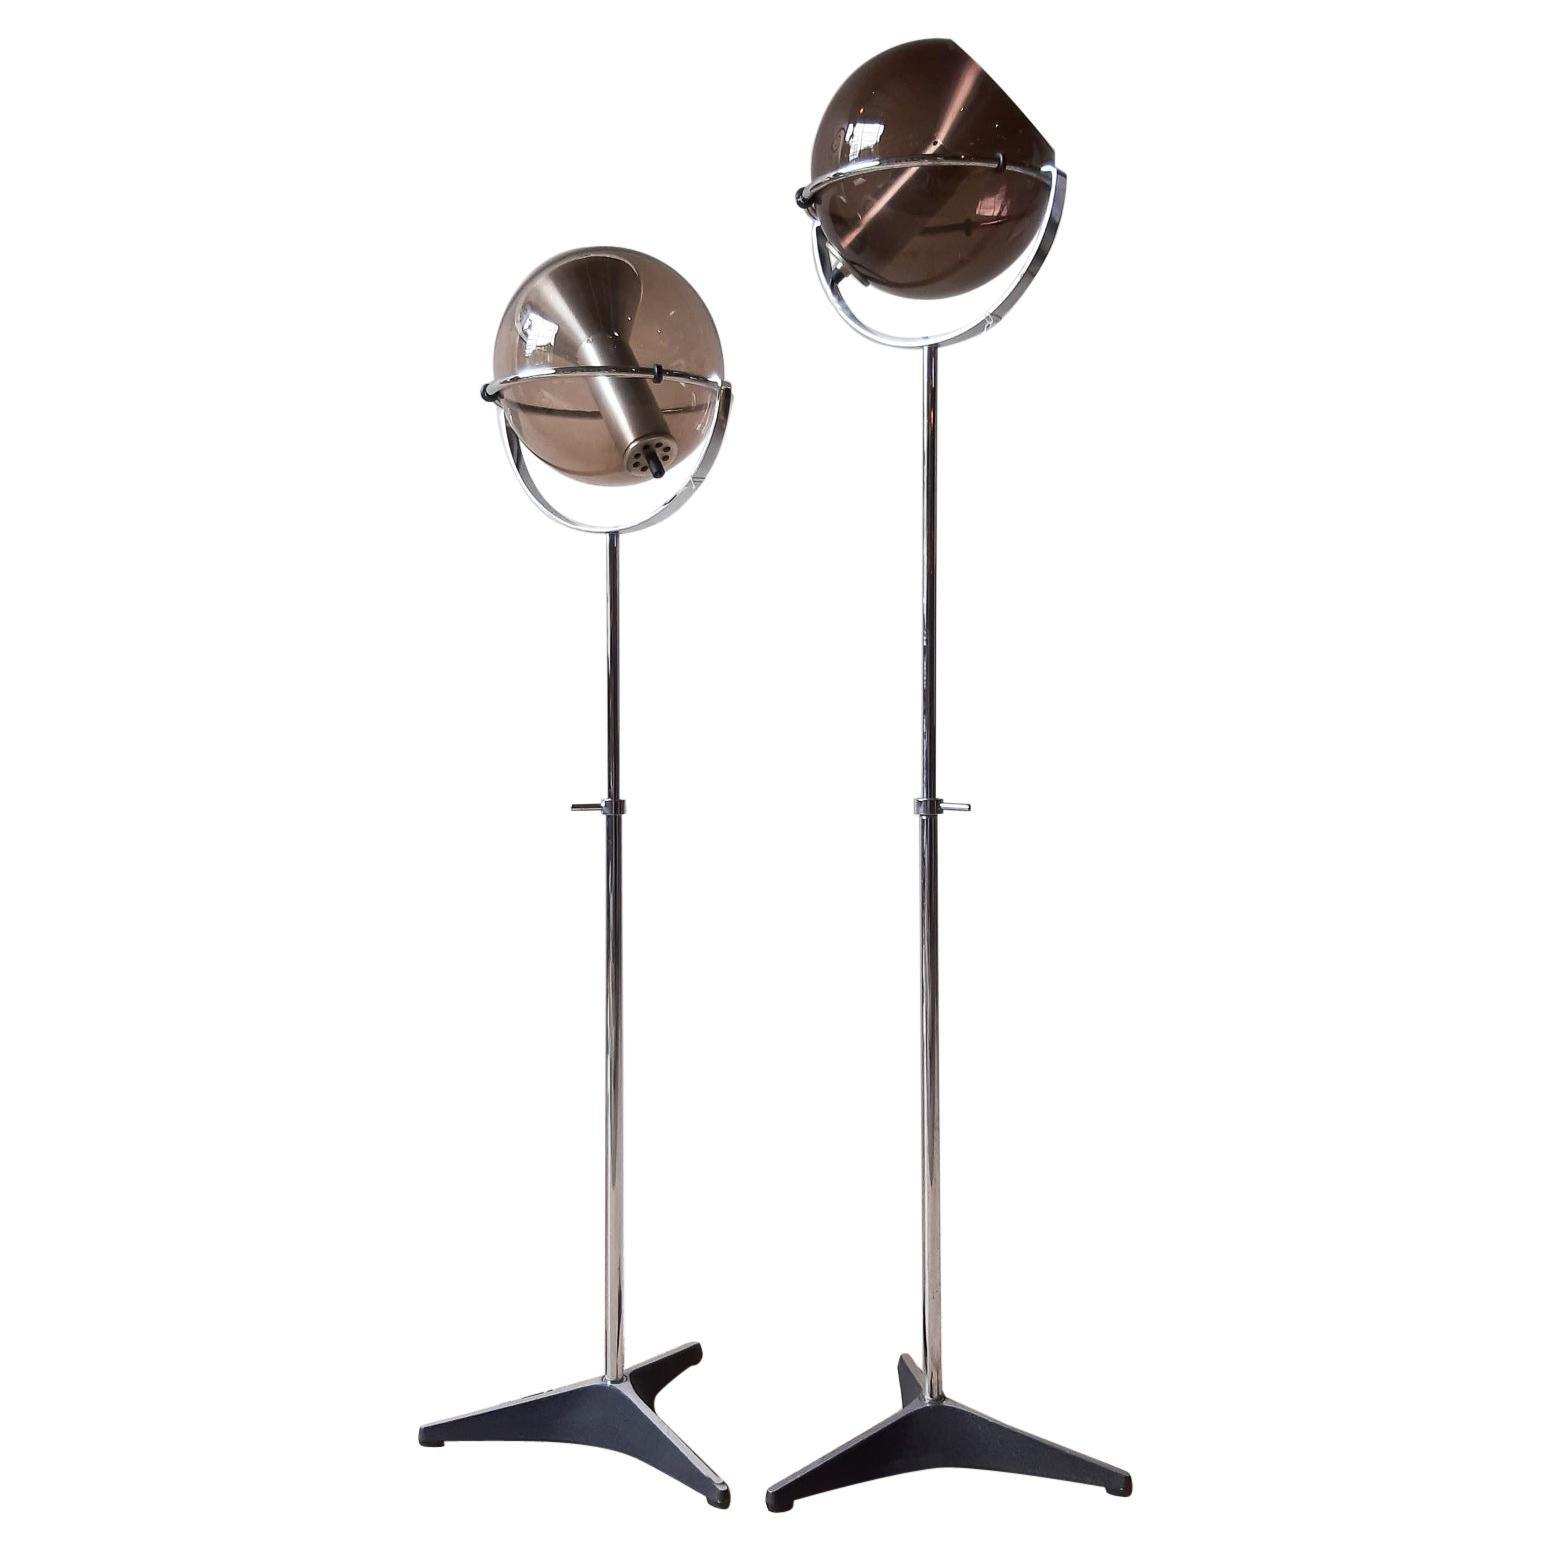 Set of Two 1960s Globe Floor Lamps by Frank Ligtelijn for RAAK Amsterdam